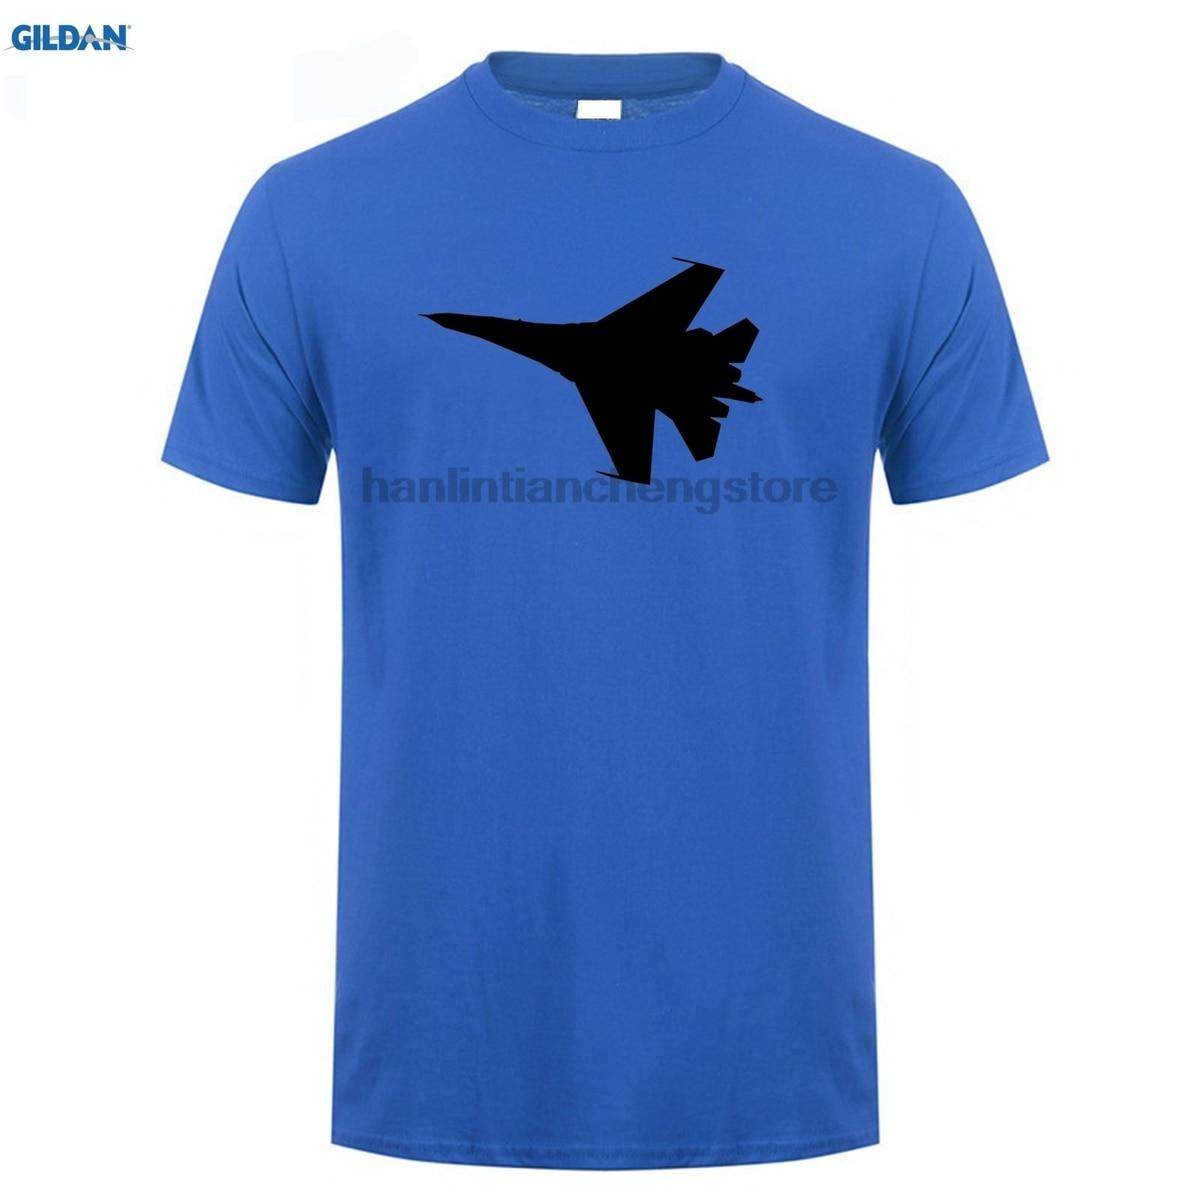 GILDAN Summer style mens T-shirt  Su-27 Evolution - Aviation Kids T-Shirt for men